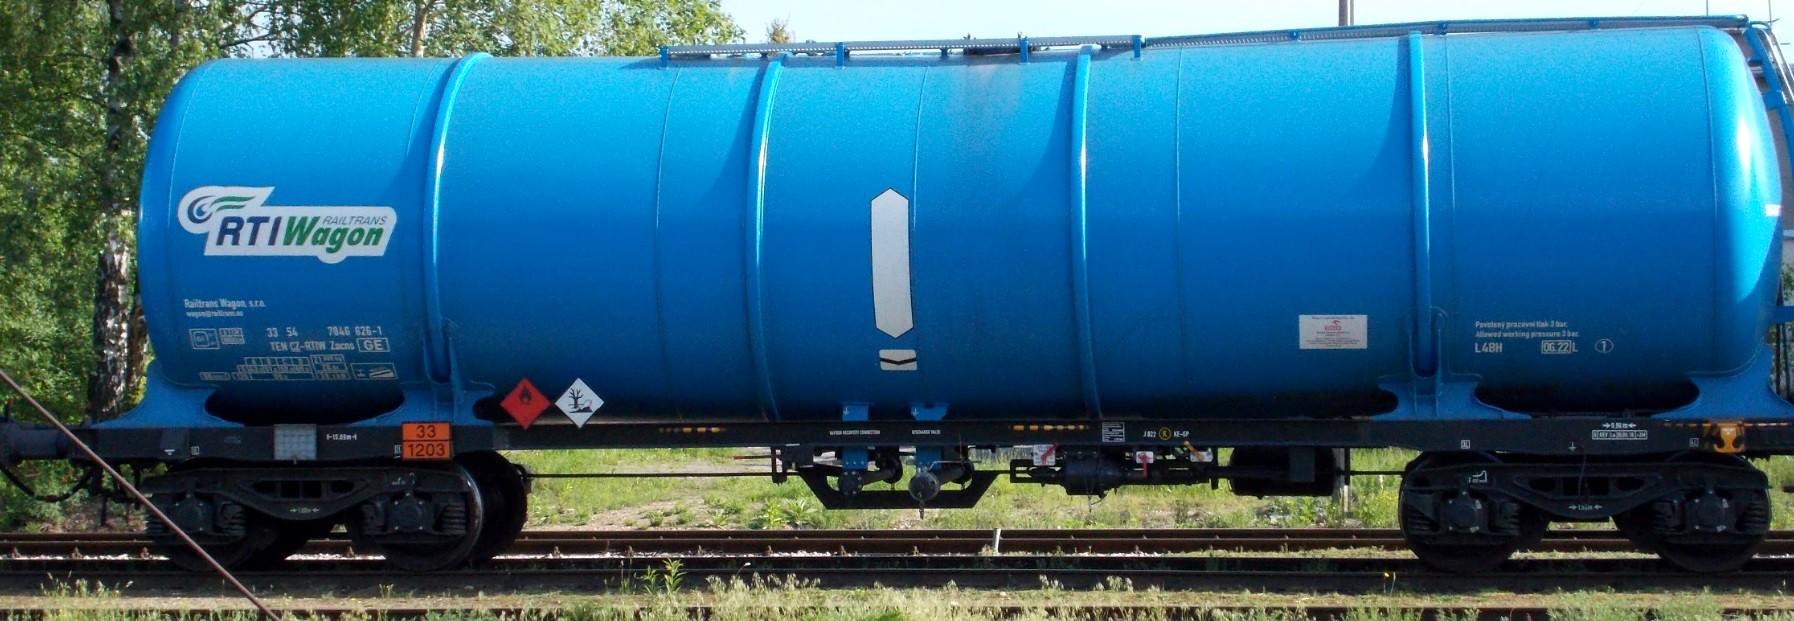 Gutkowo 31.05.2019. Cysterna 33 54 7846 626-1, TEN CZ-RTIW, Zacns - Railtrans Wagon. s.r.o (Cz...jpg